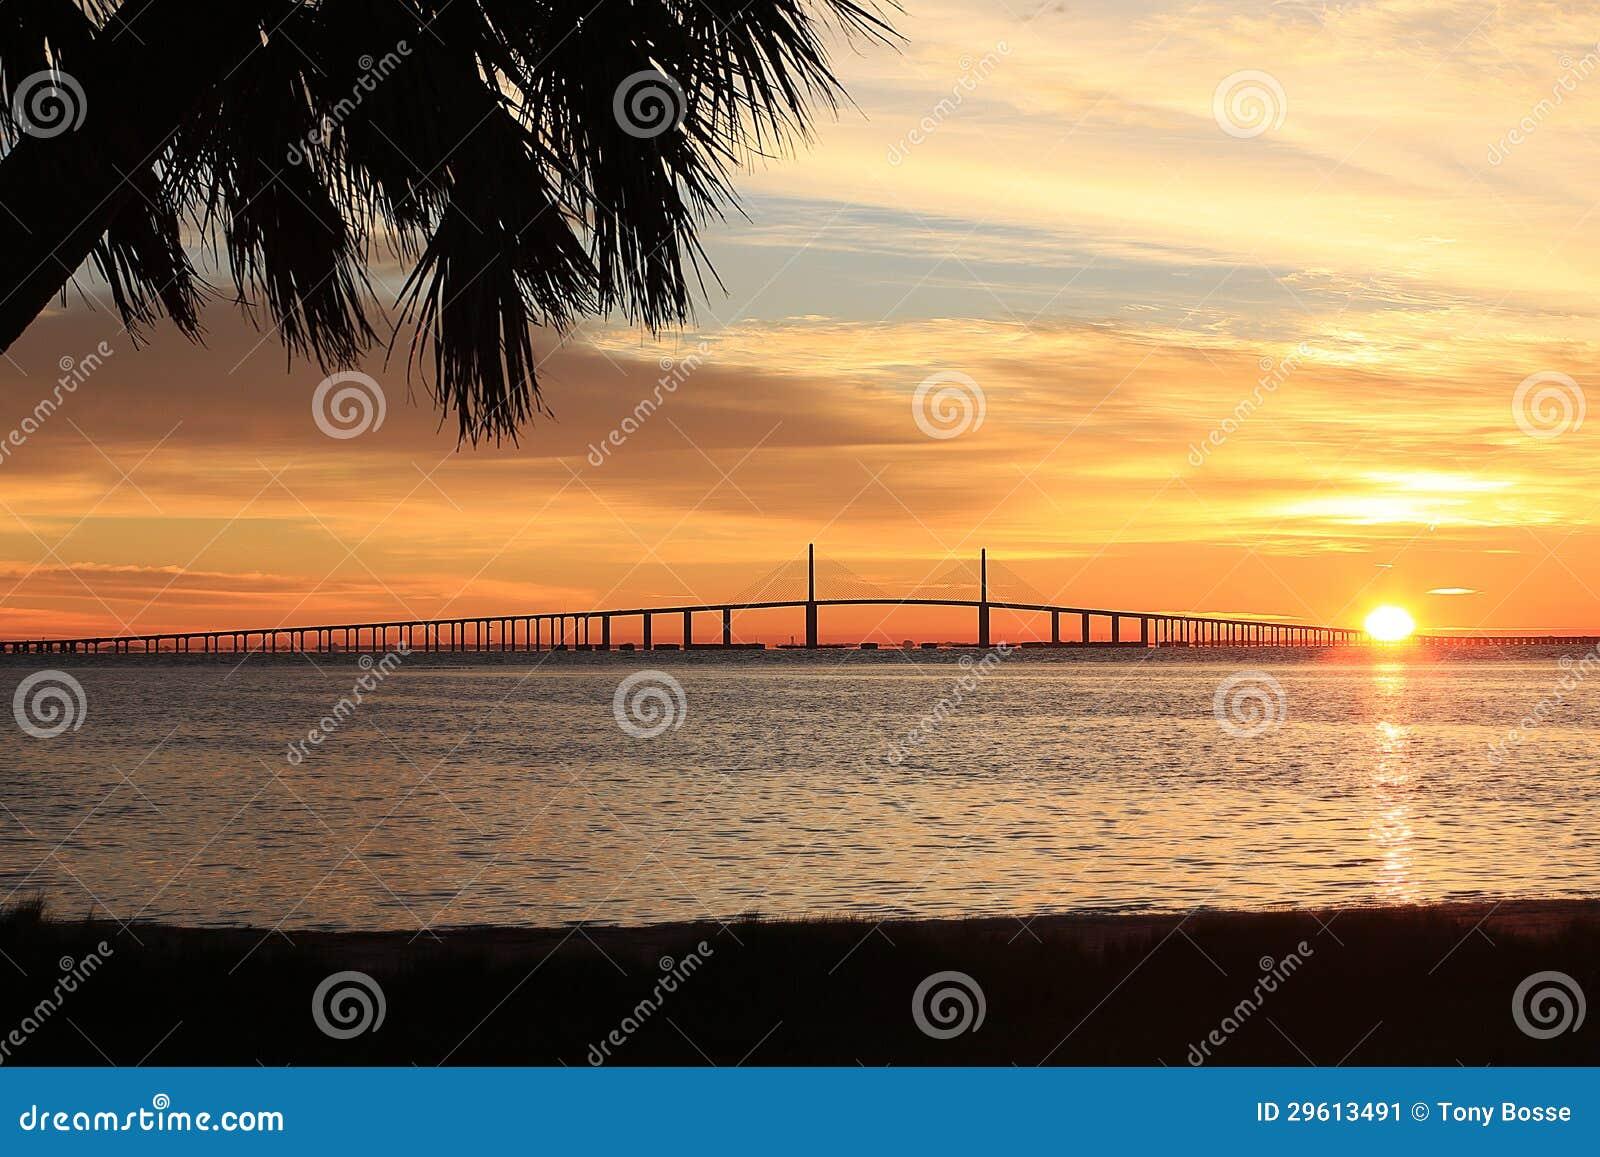 Sunshine Skyway Bridge in Florida at Sunrise